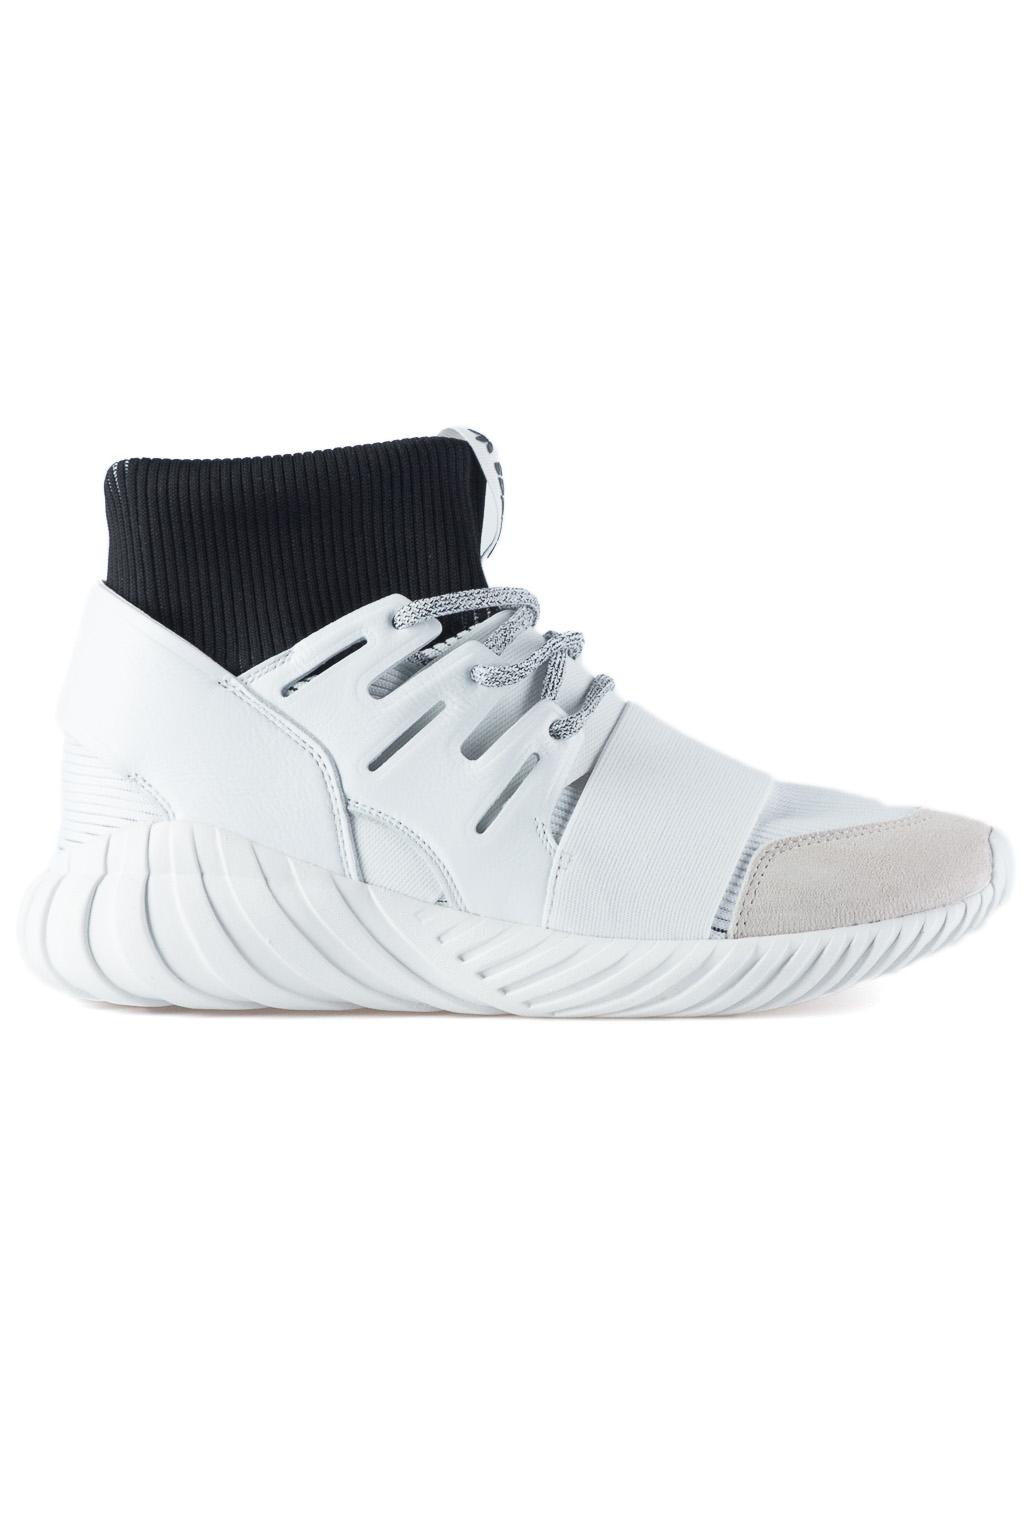 hot sale online bbecf 8ba7c Adidas Tubular Doom - Yin Yang Pack White